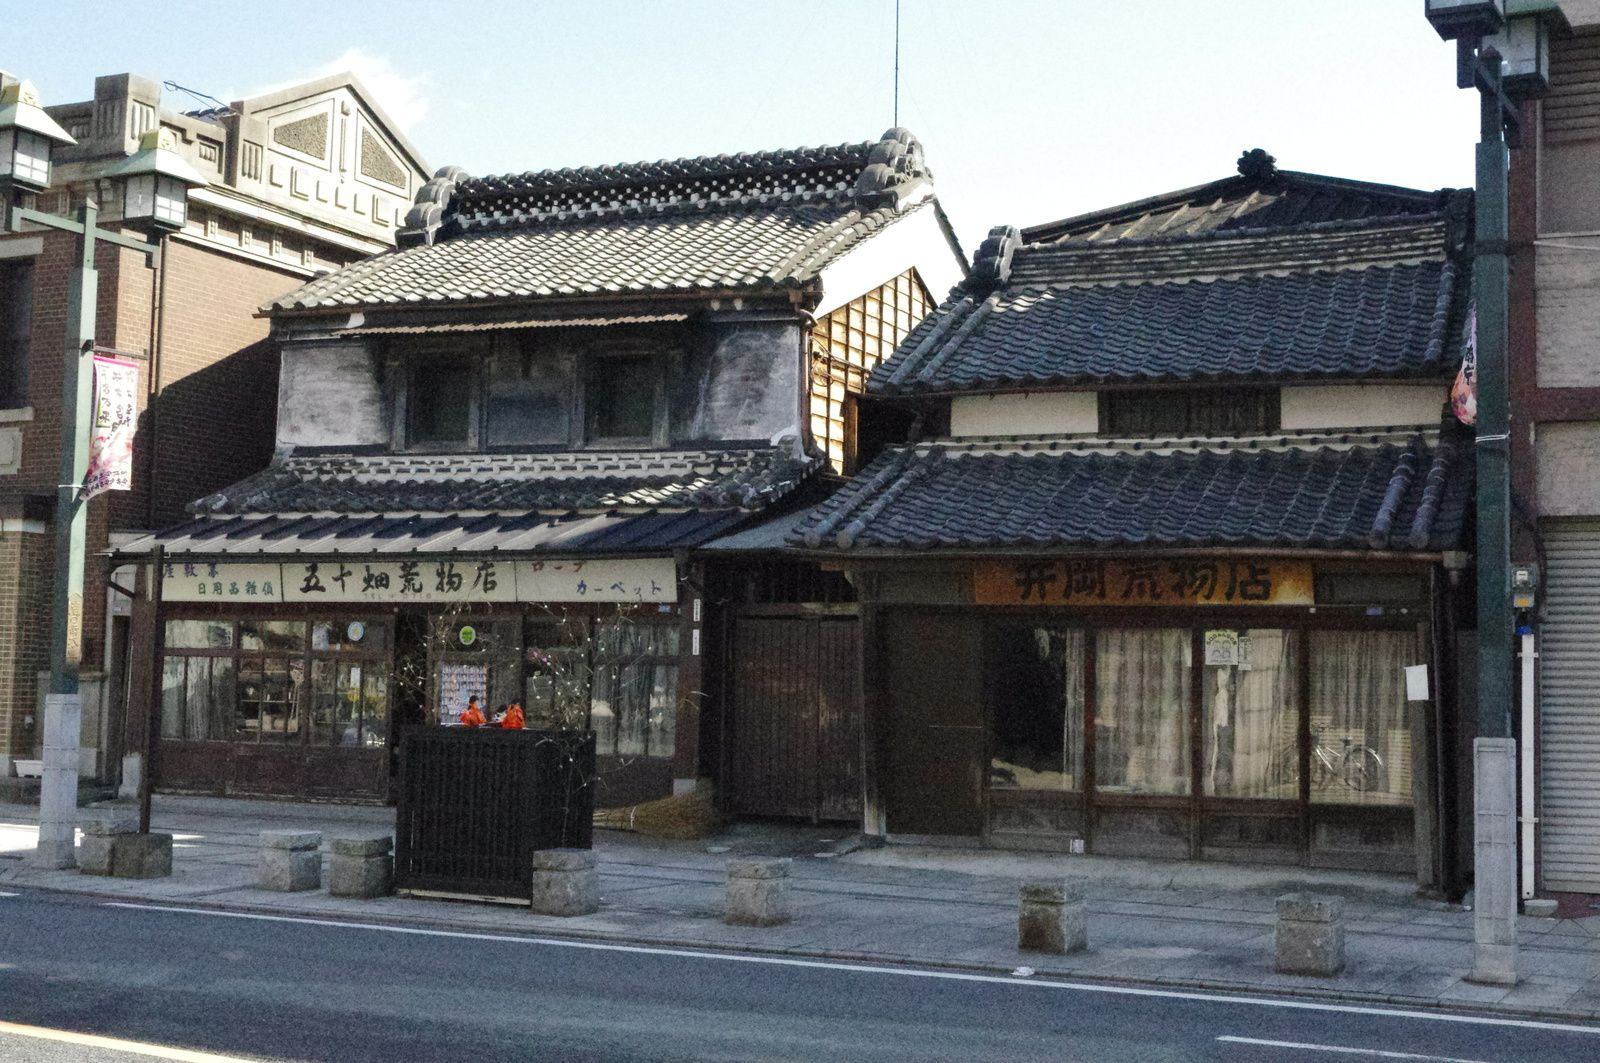 Tochigi 6 mars 2014